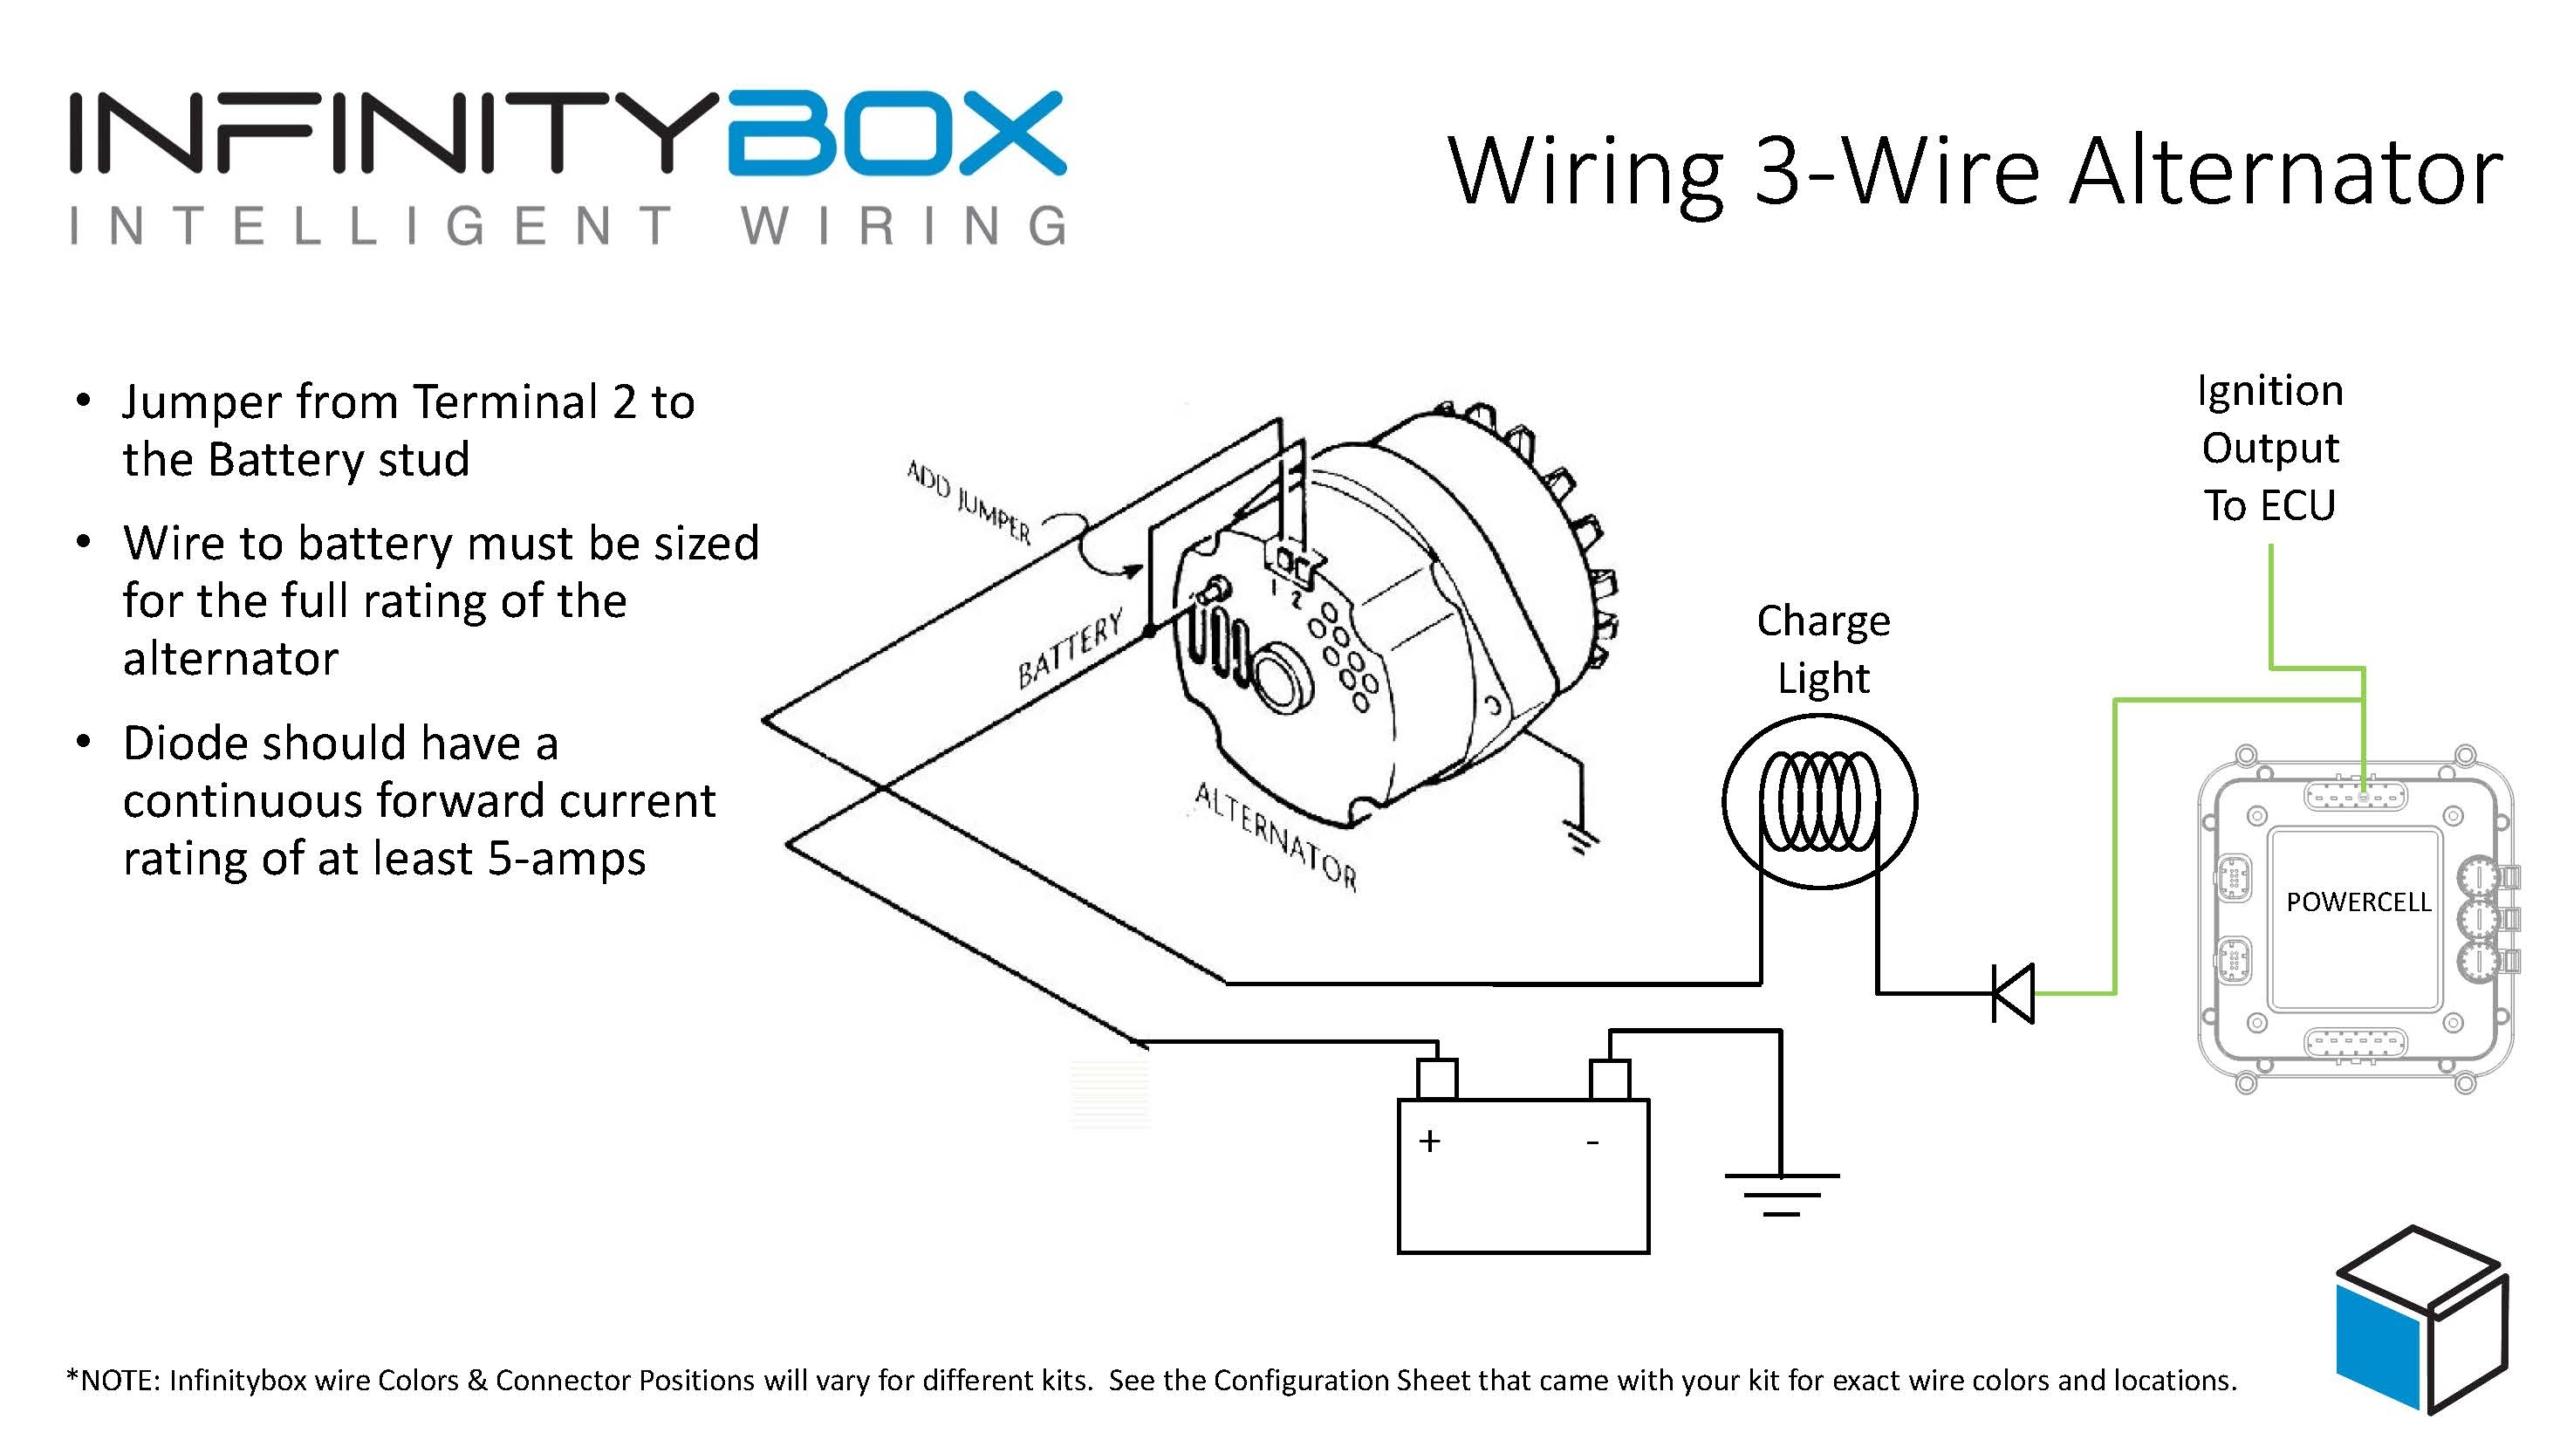 3-wire alternator - infinitybox  infinitybox